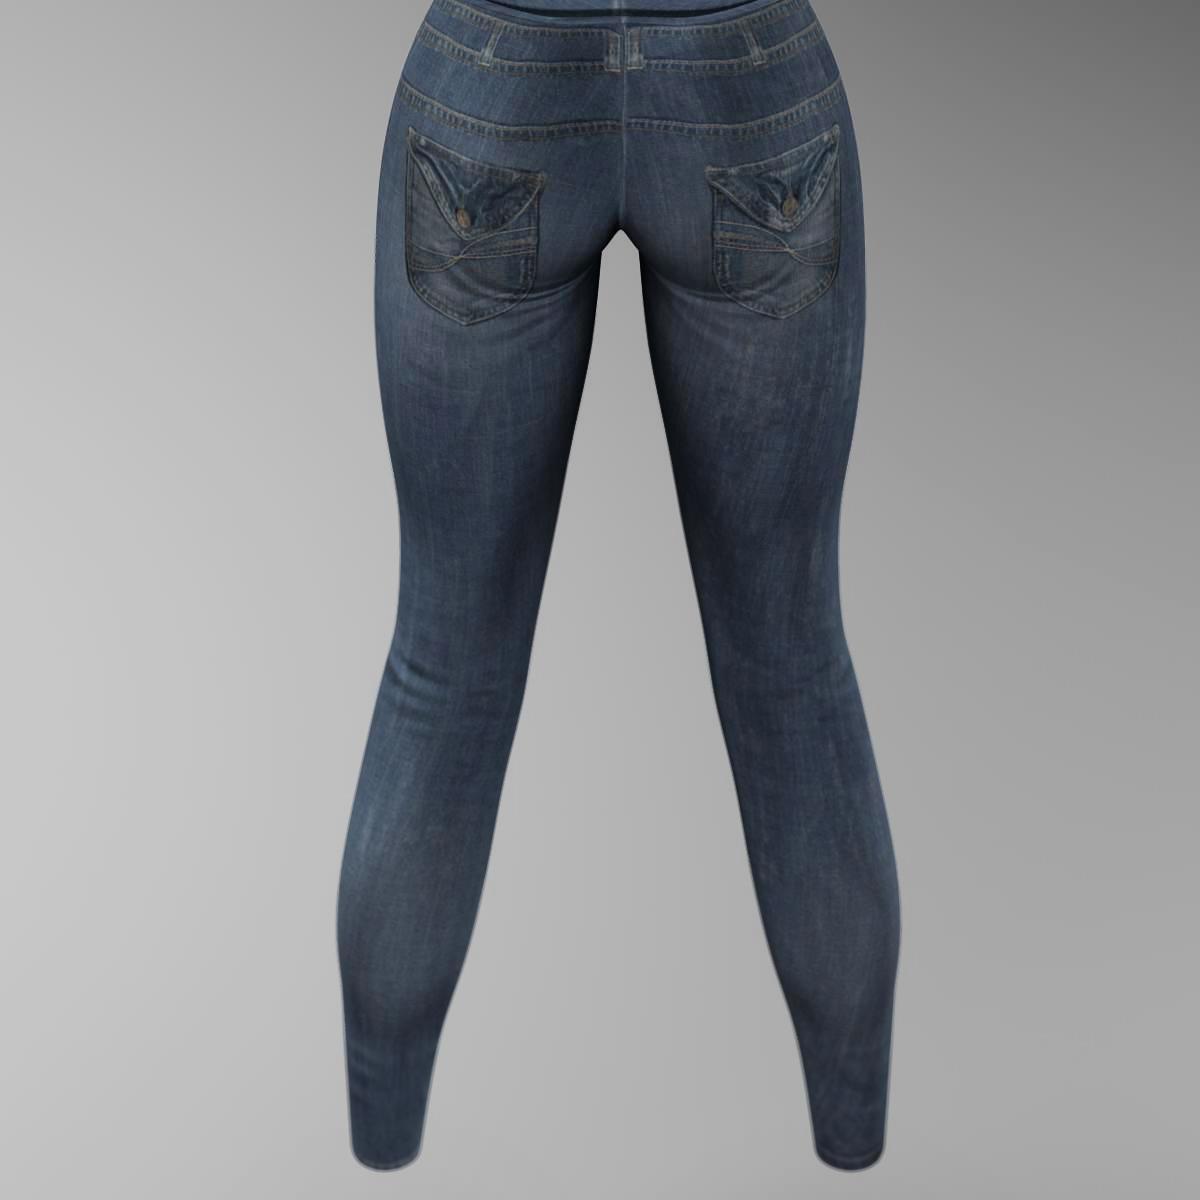 female jeans 3d model 3ds max fbx c4d ma mb obj 160404